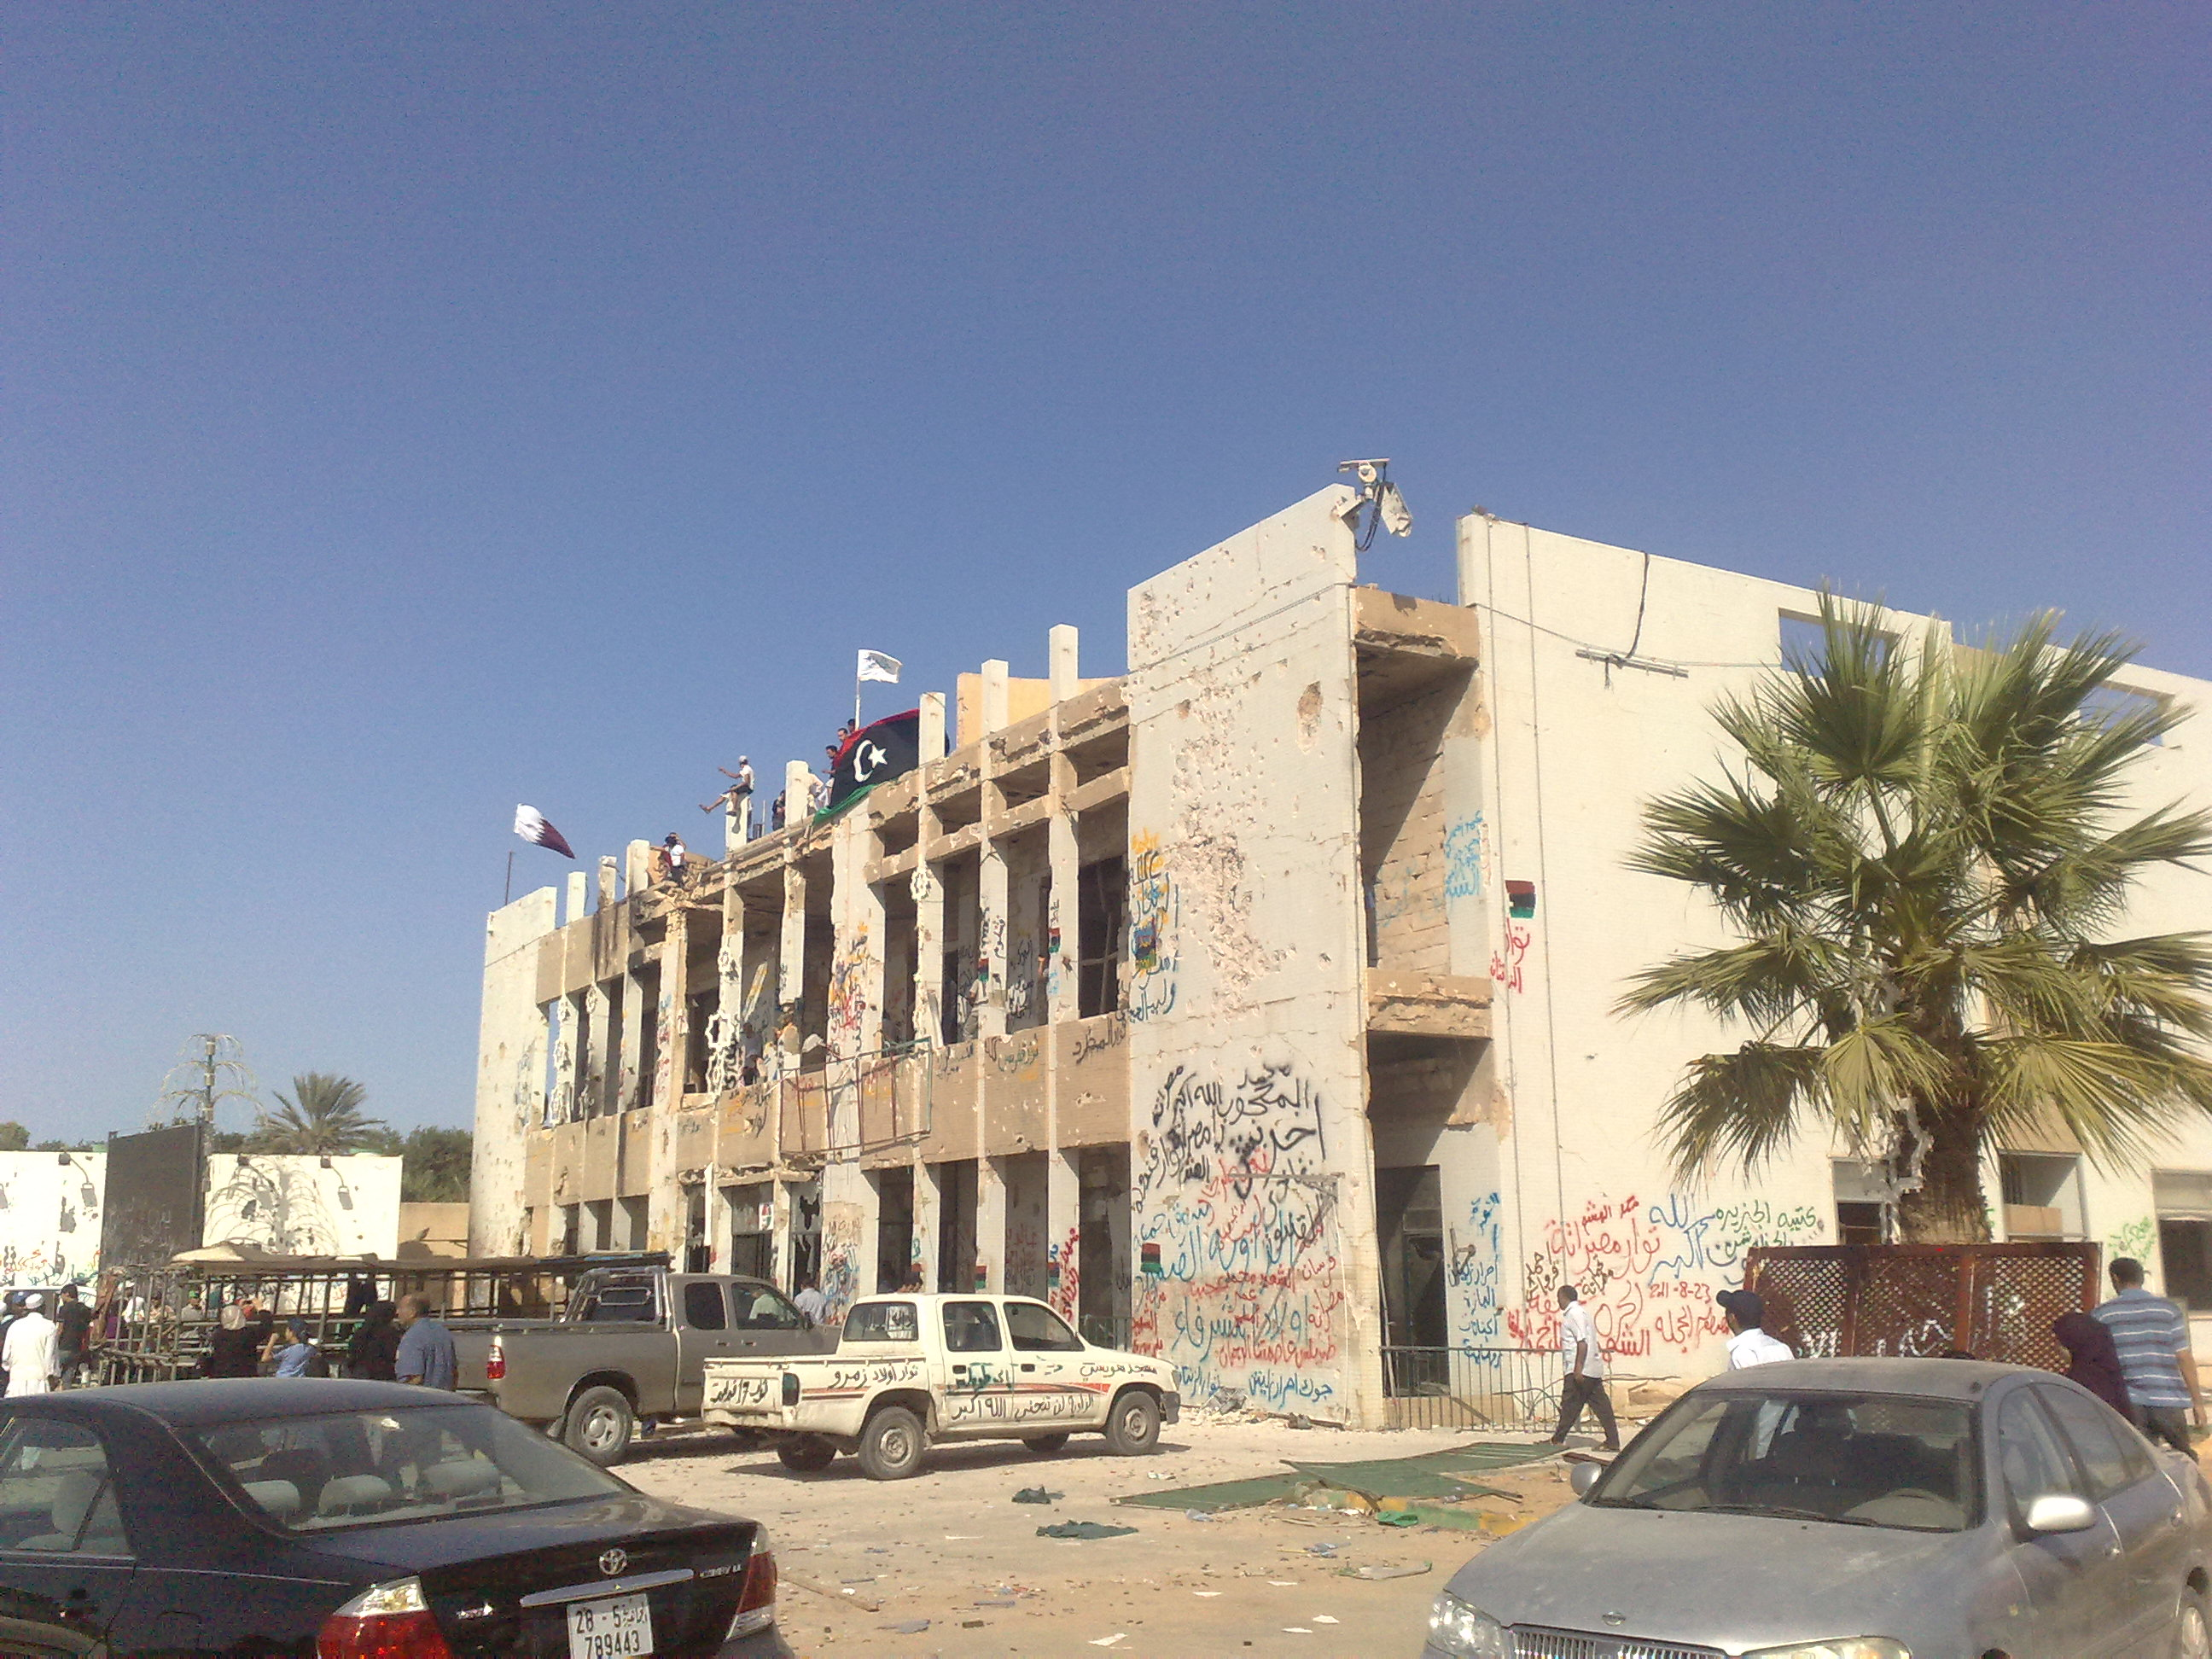 Libia - Author free libyan